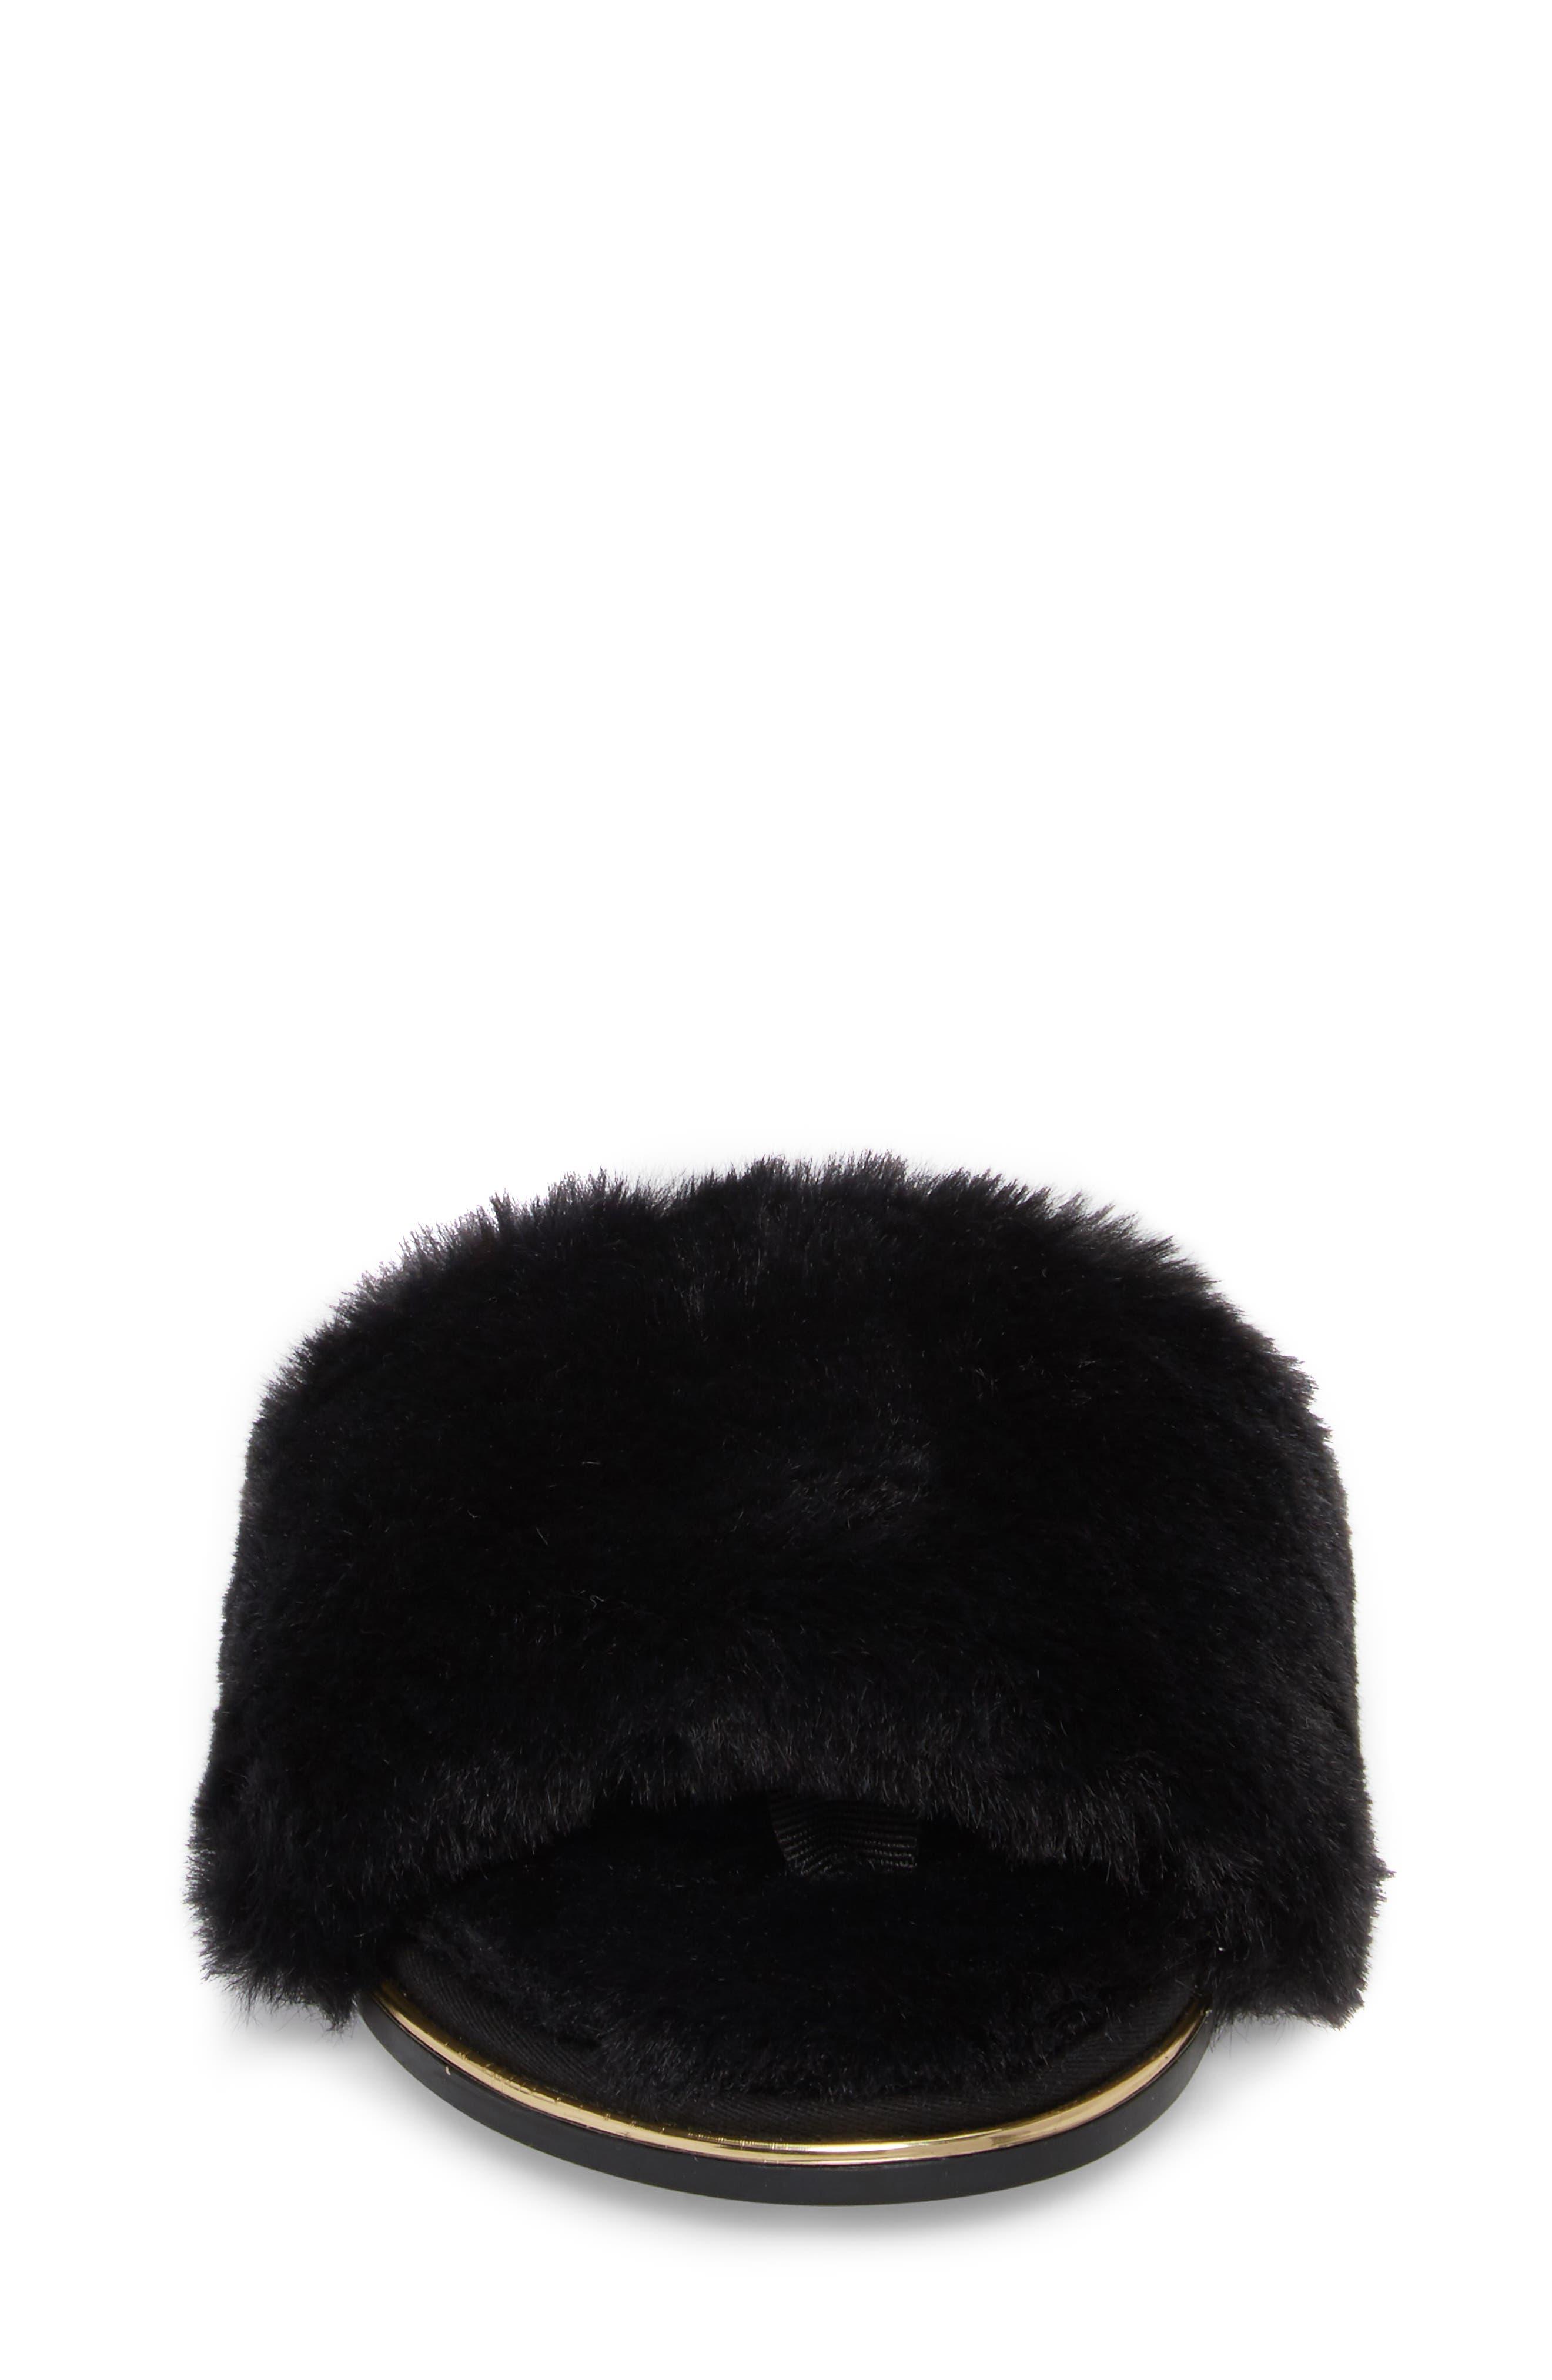 Rose Faux Fur Slide Sandal,                             Alternate thumbnail 4, color,                             BLACK FAUX FUR